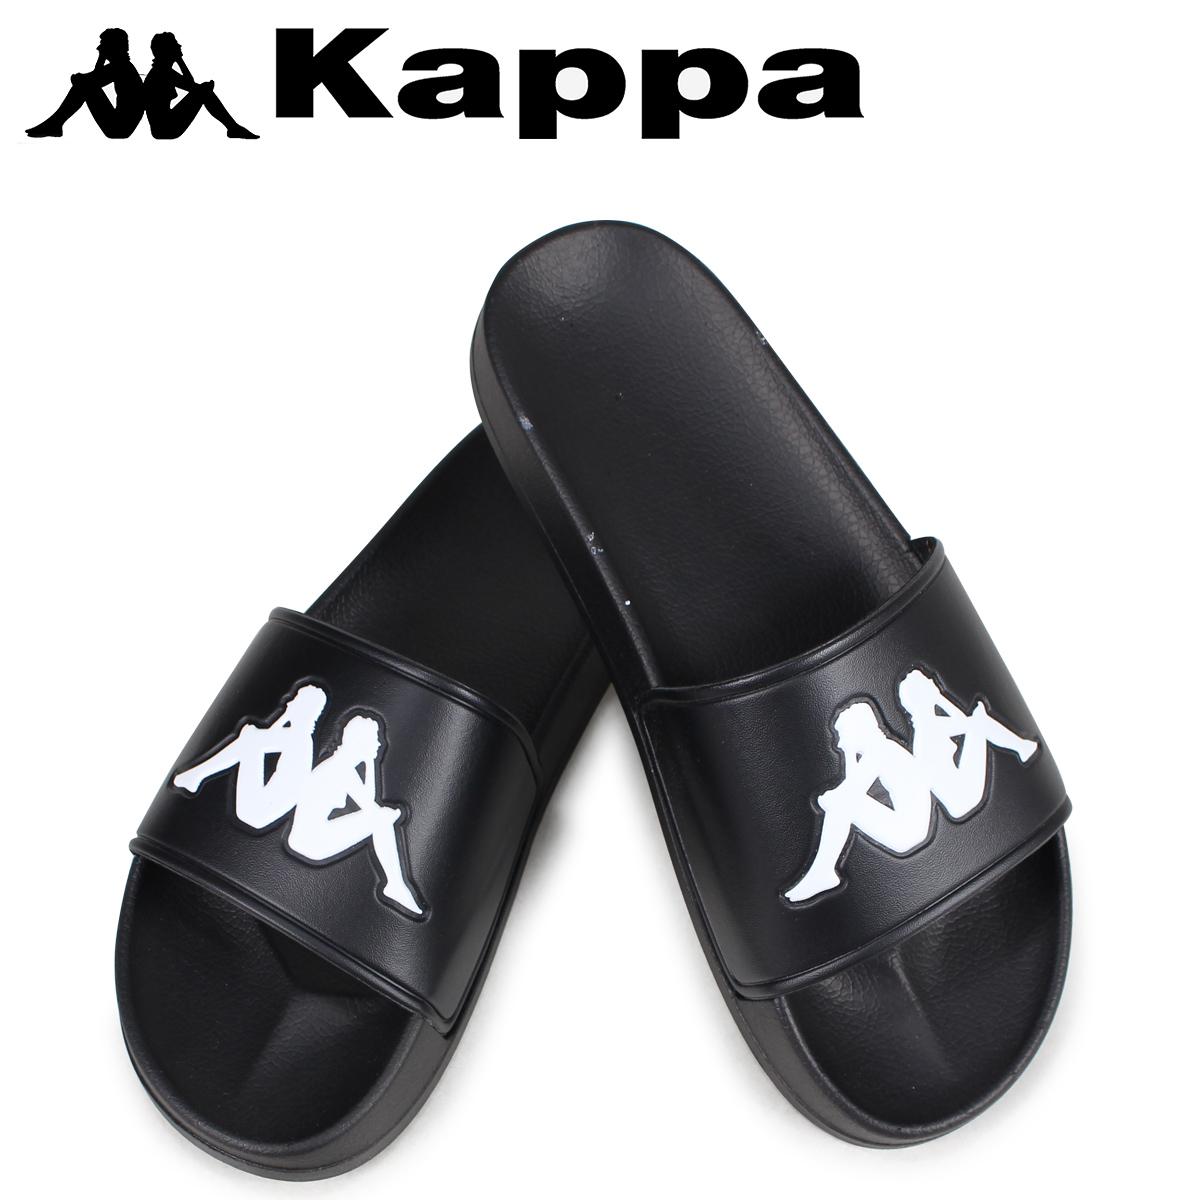 56d11e6d55d41 Sugar Online Shop  Kappa rain jacket sandals shower sandals sports ...